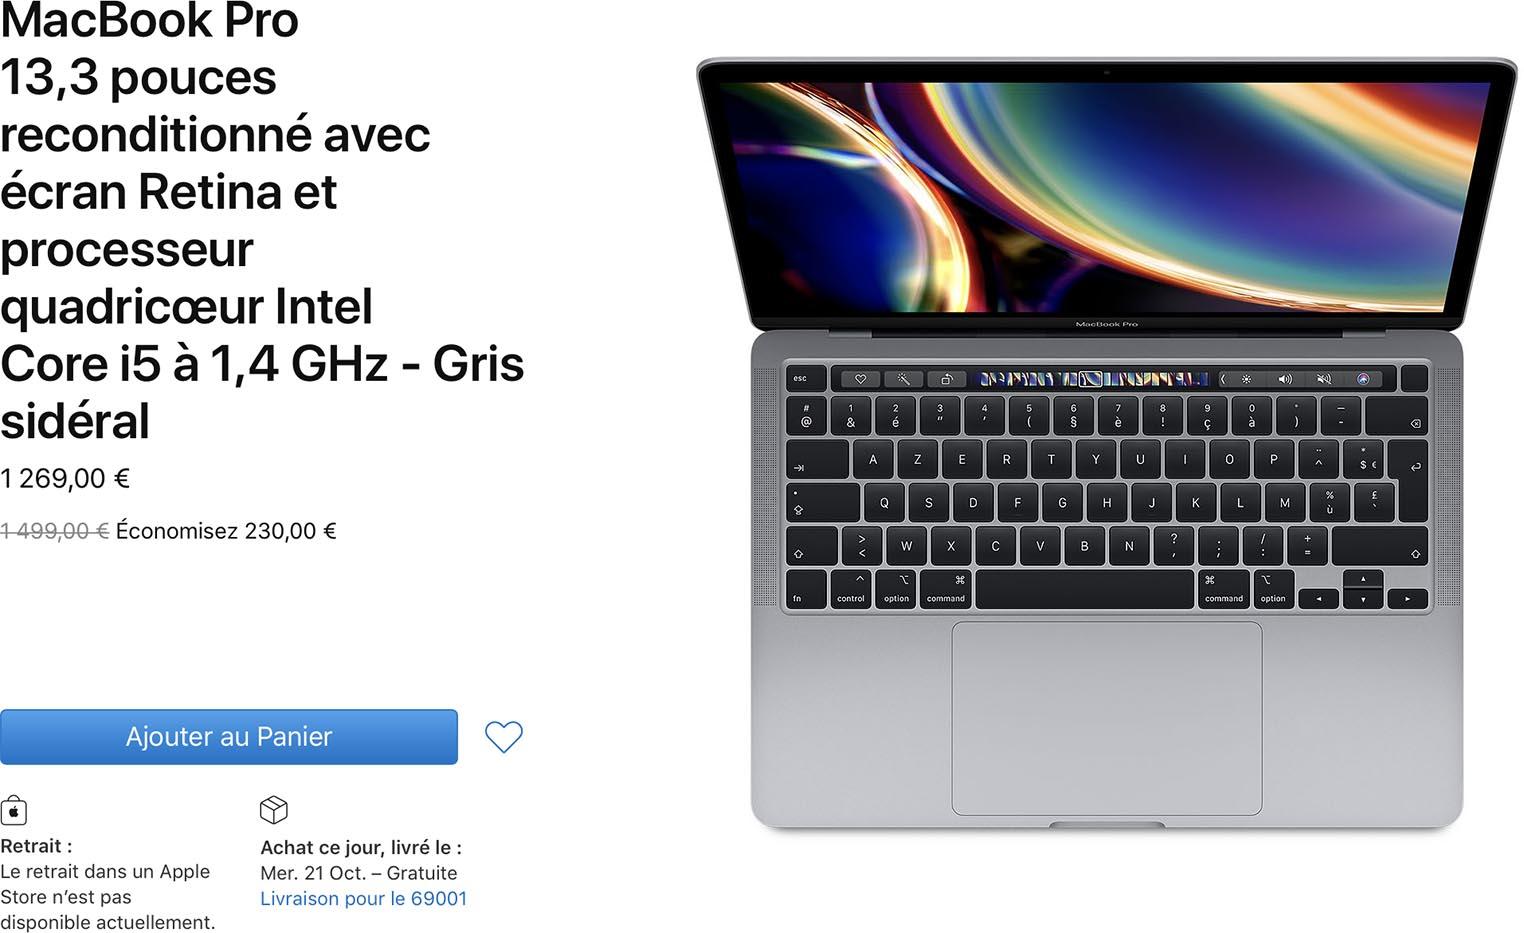 MacBook Pro 2020 Refurb Store